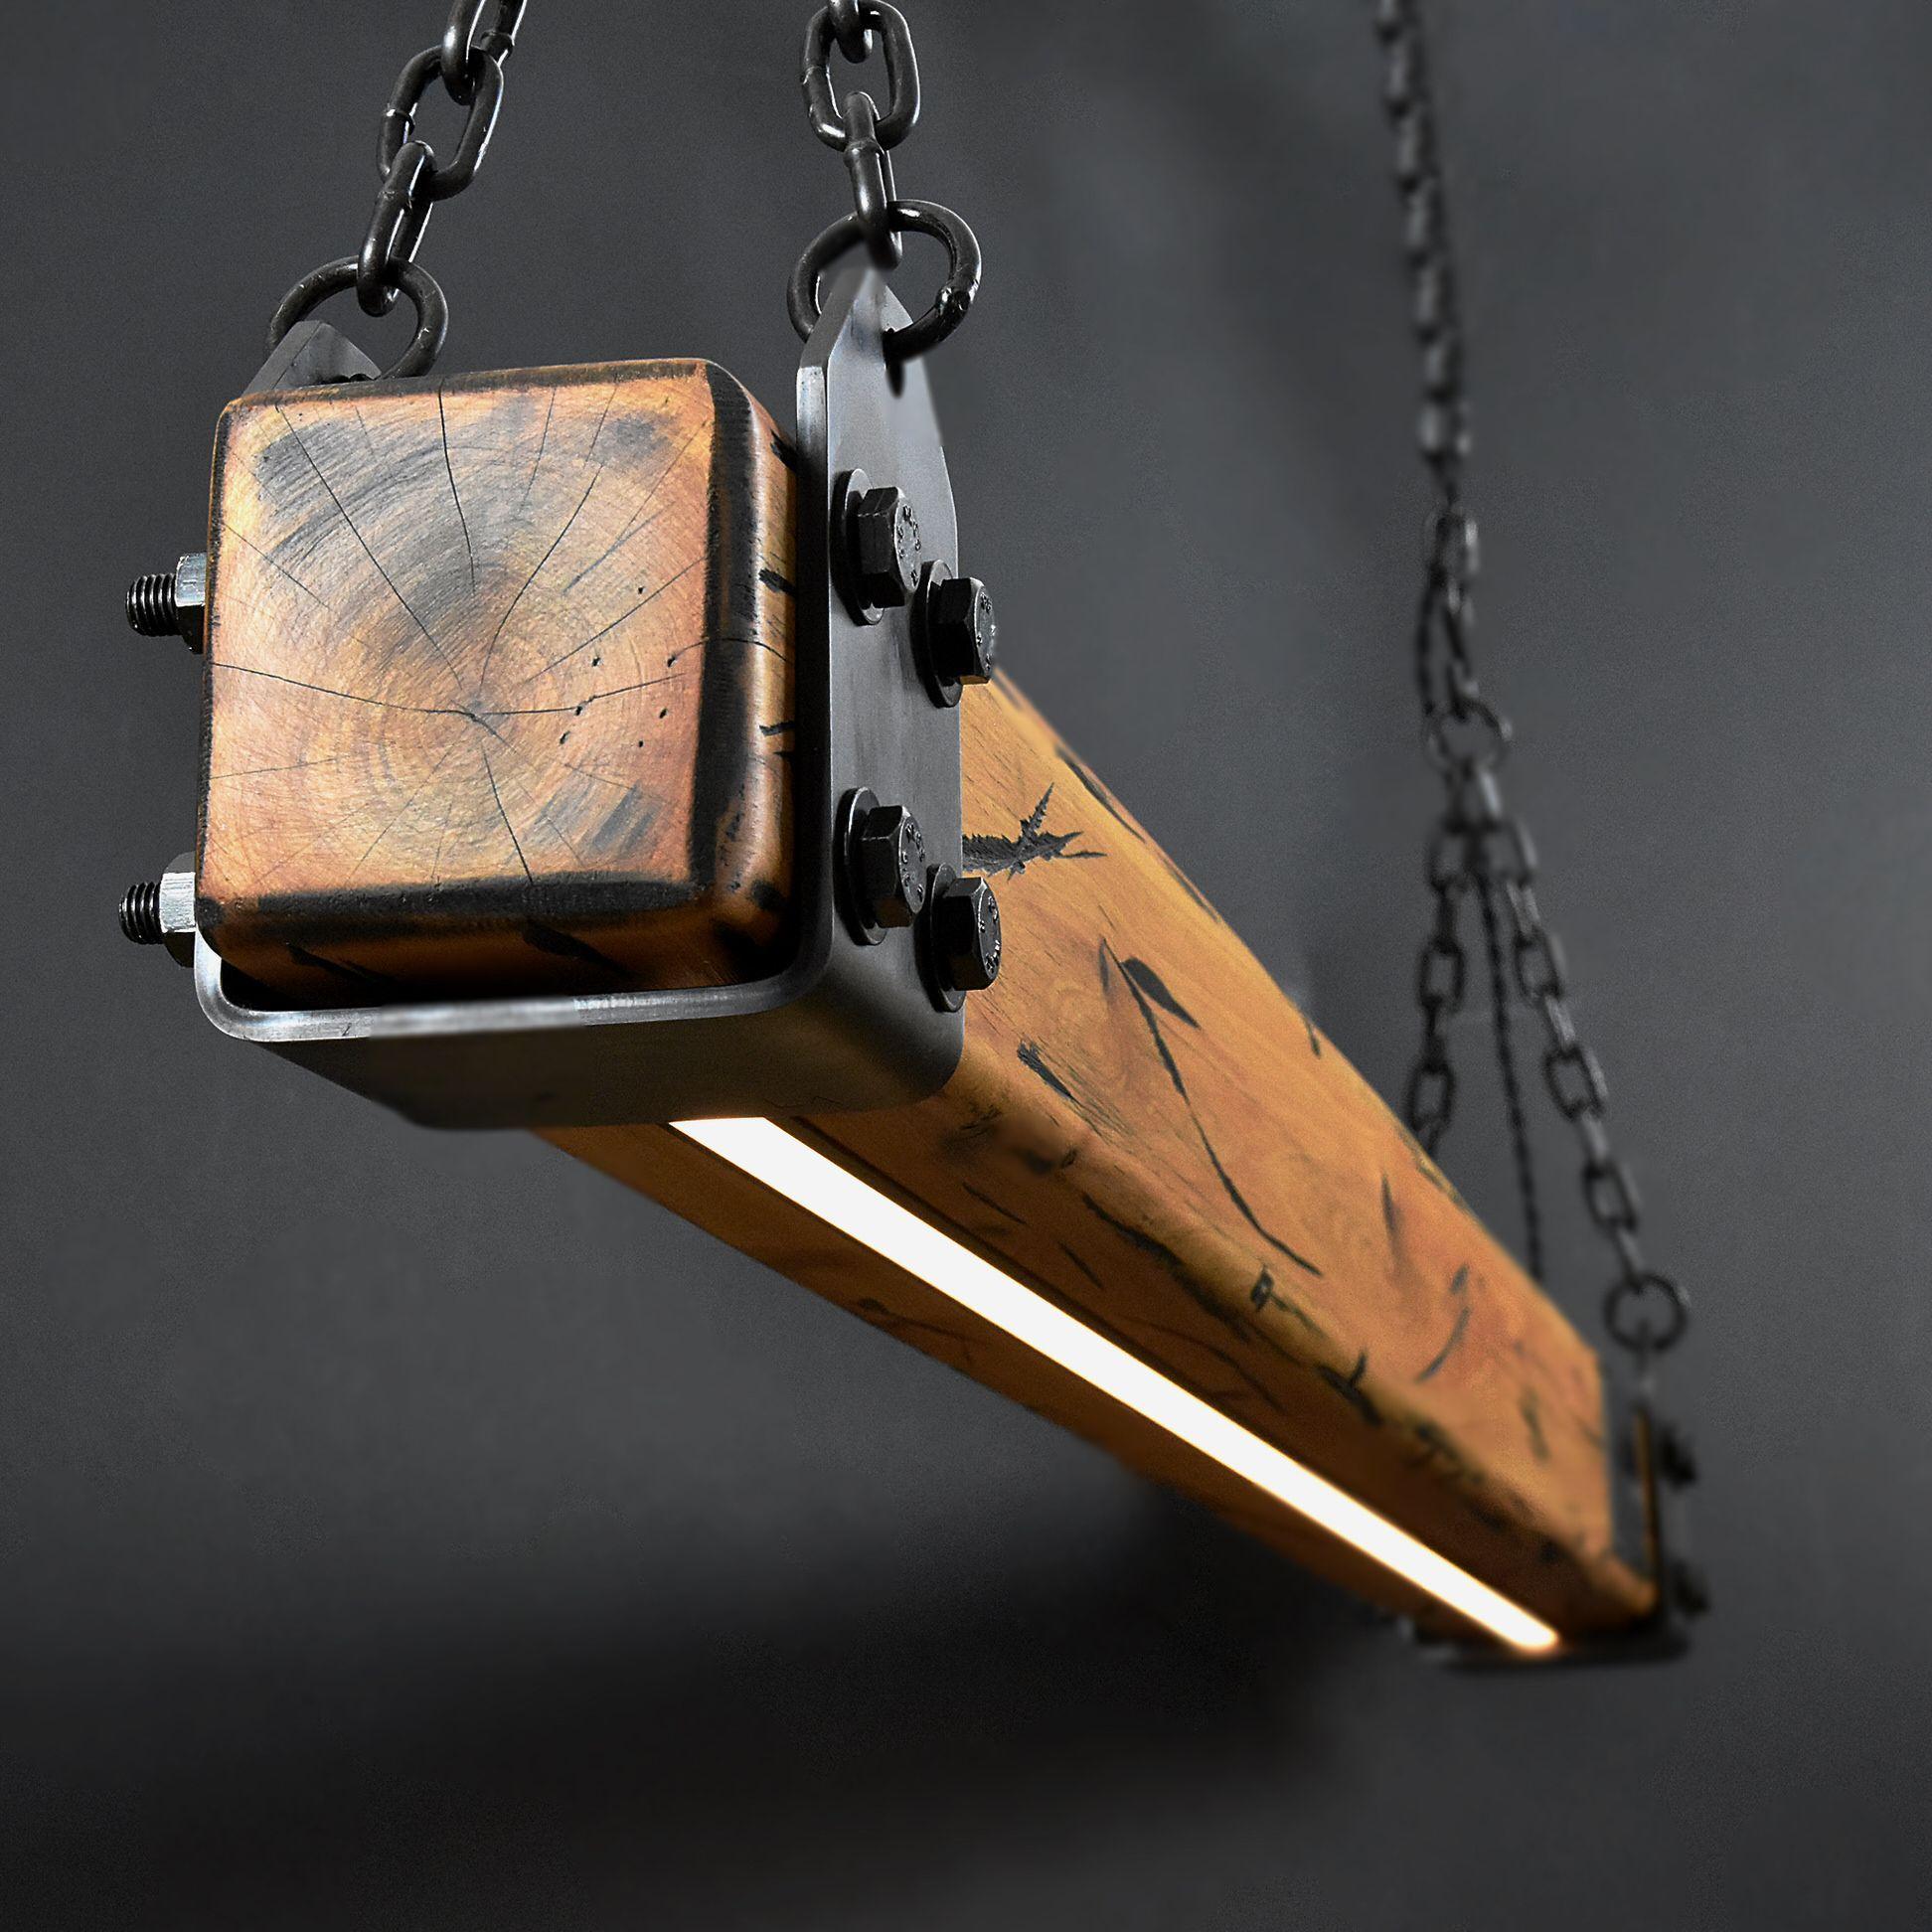 Wood Beam Led Pendant Light No 2 Remote Control Dimmer Linear Lighting Zimmerdecke Balken Wood Holzbearbeitungstipps Led Pendelleuchte Lineare Beleuchtung